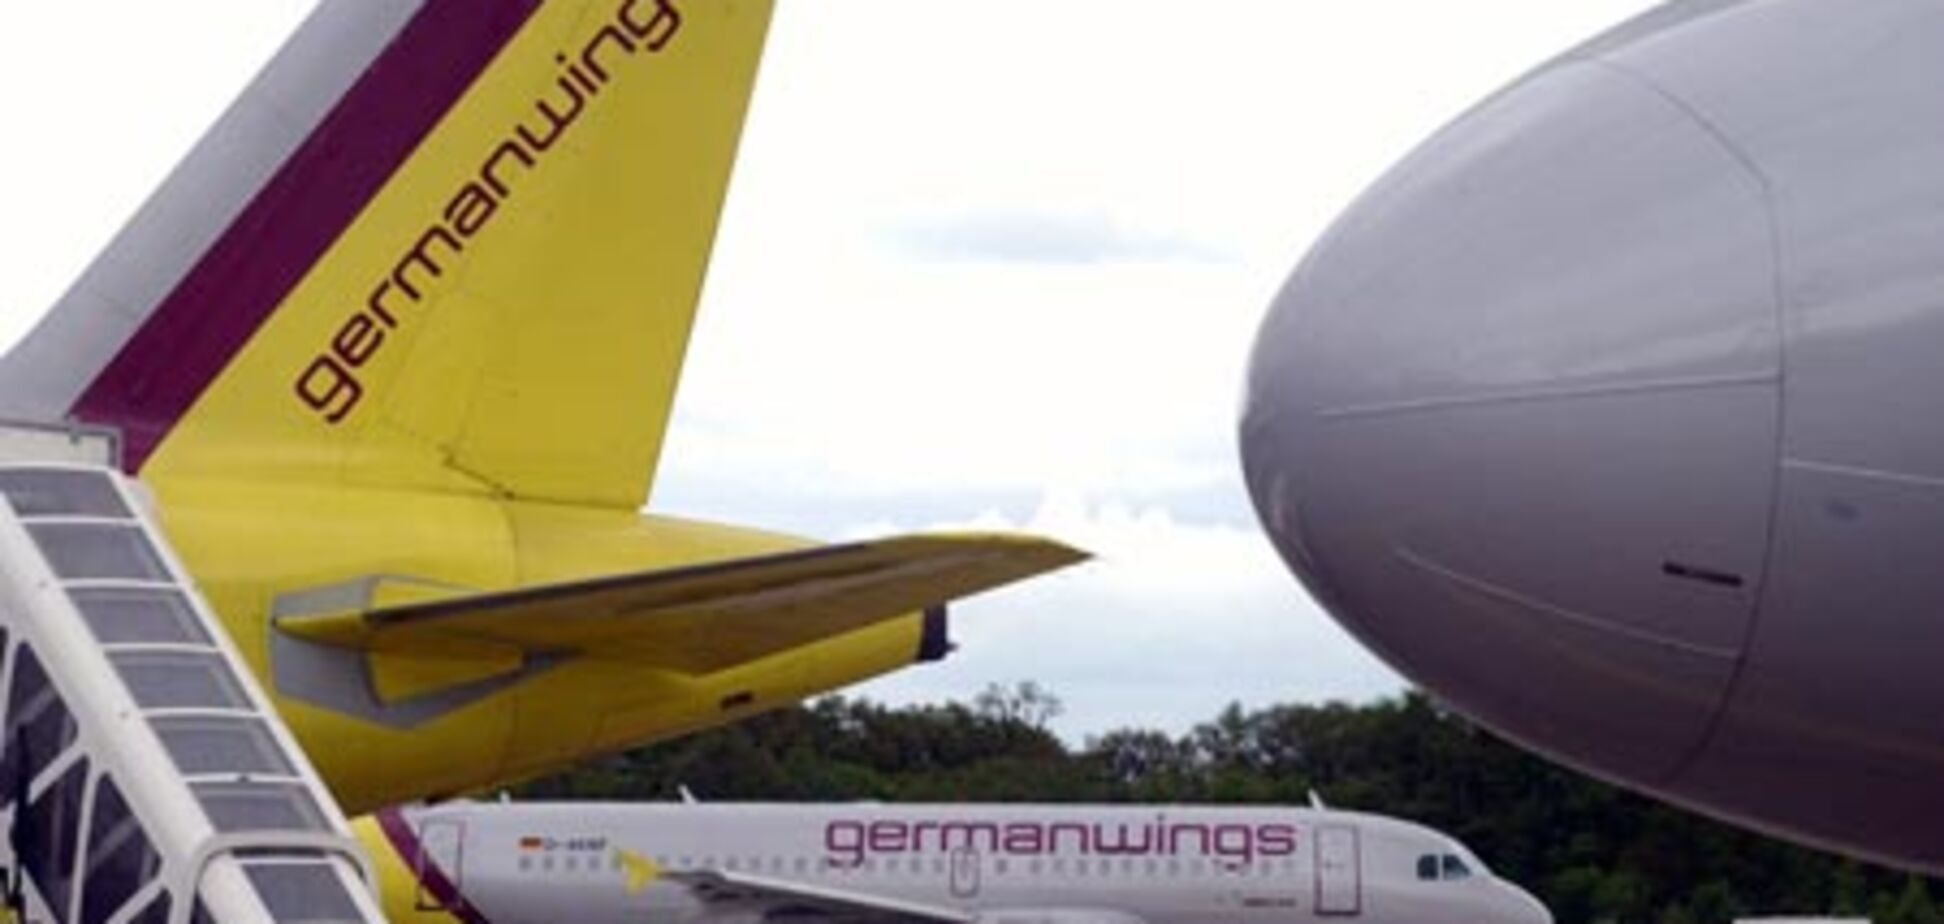 Німецький лоукостер припиняє польоти в Україну